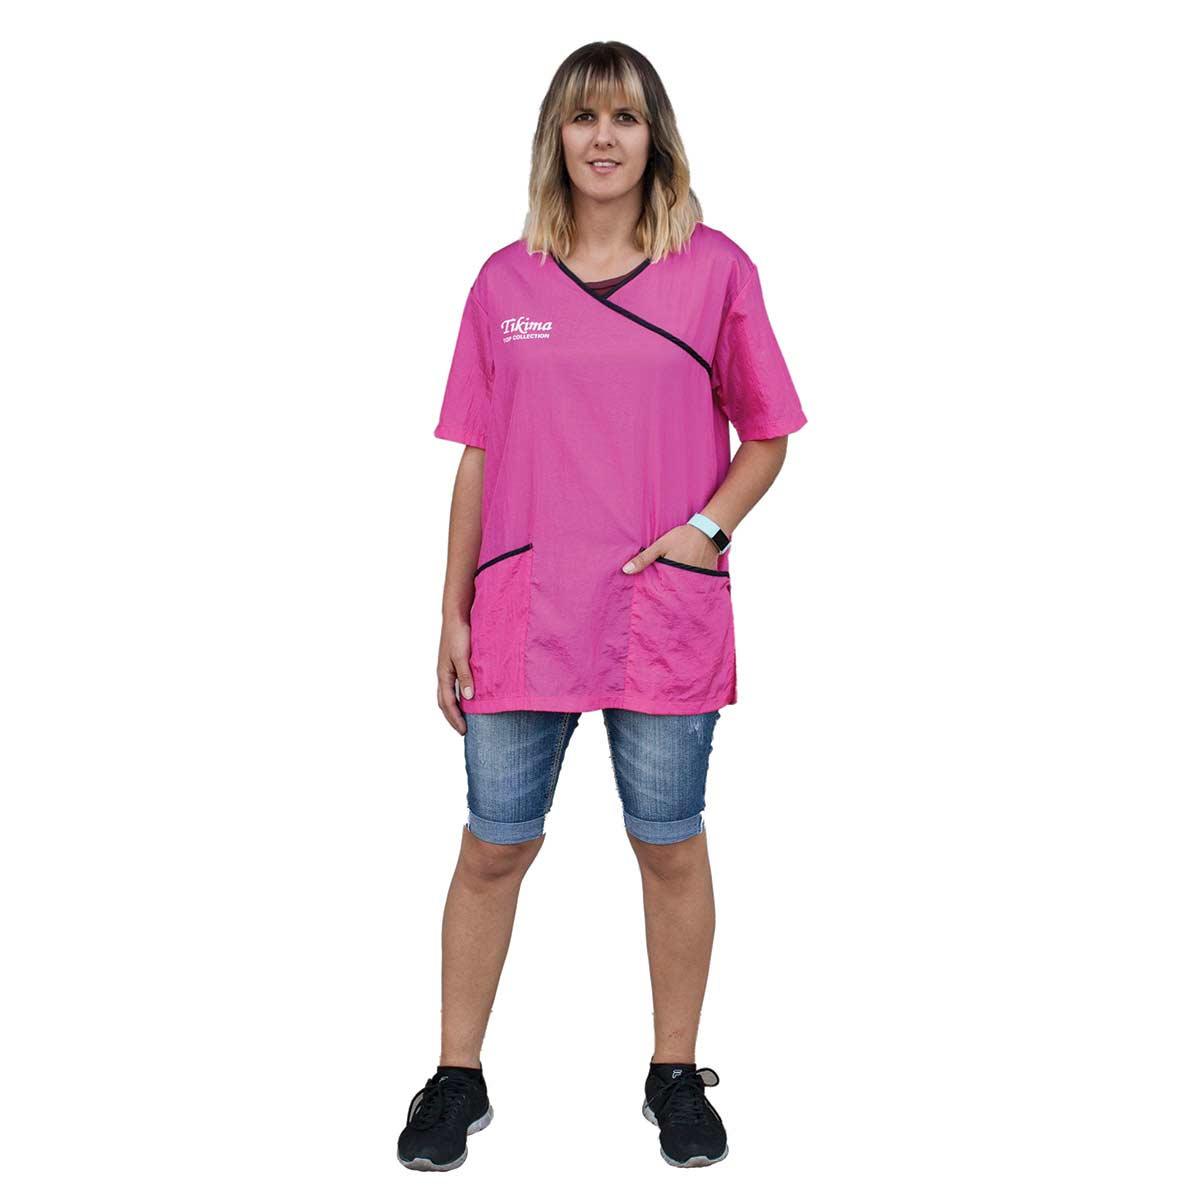 X Large Pink Tikima Fiori Grooming Shirt